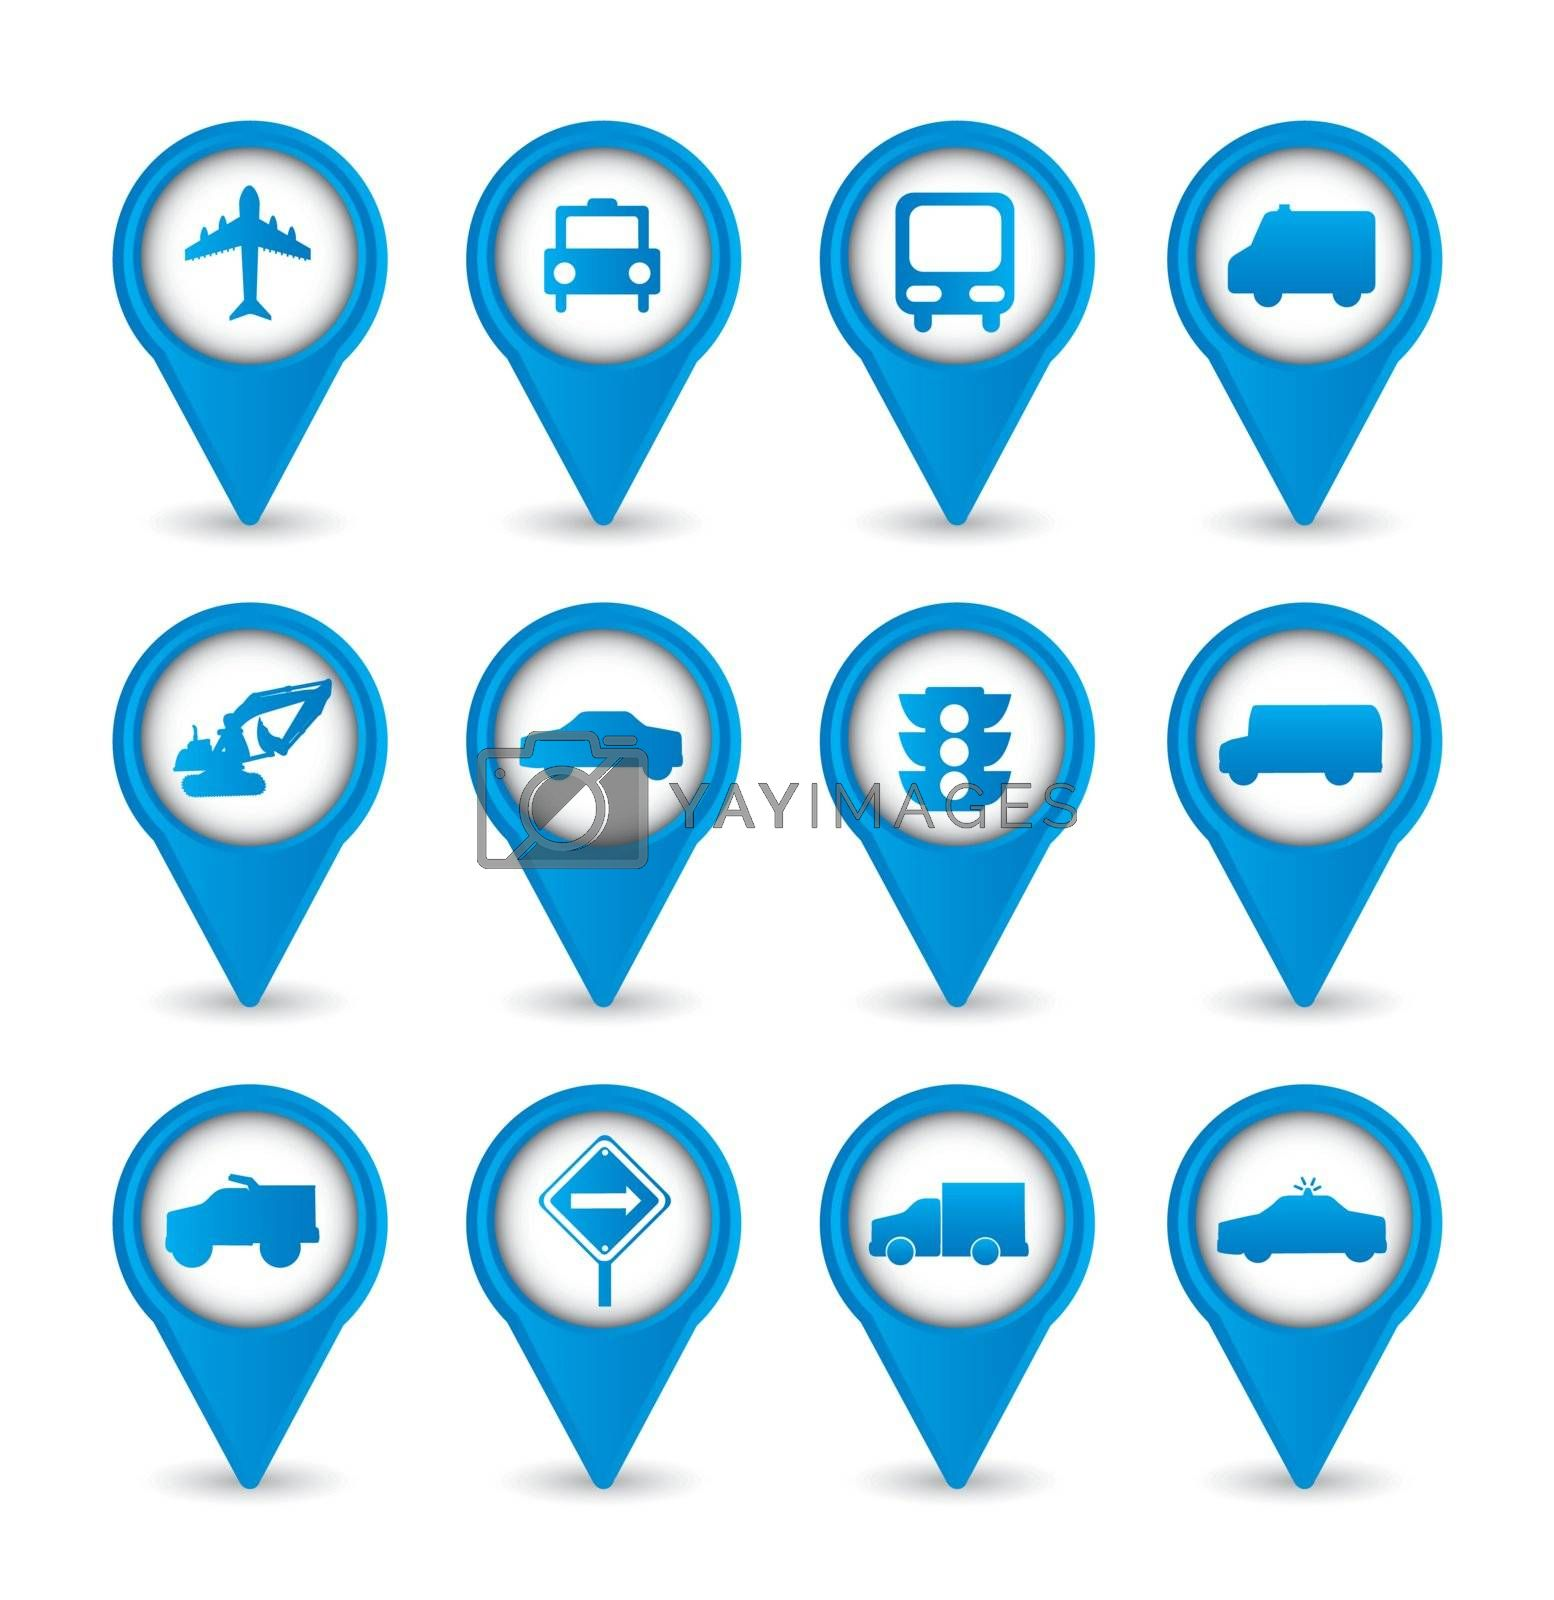 transport icons over white background. vector illustration